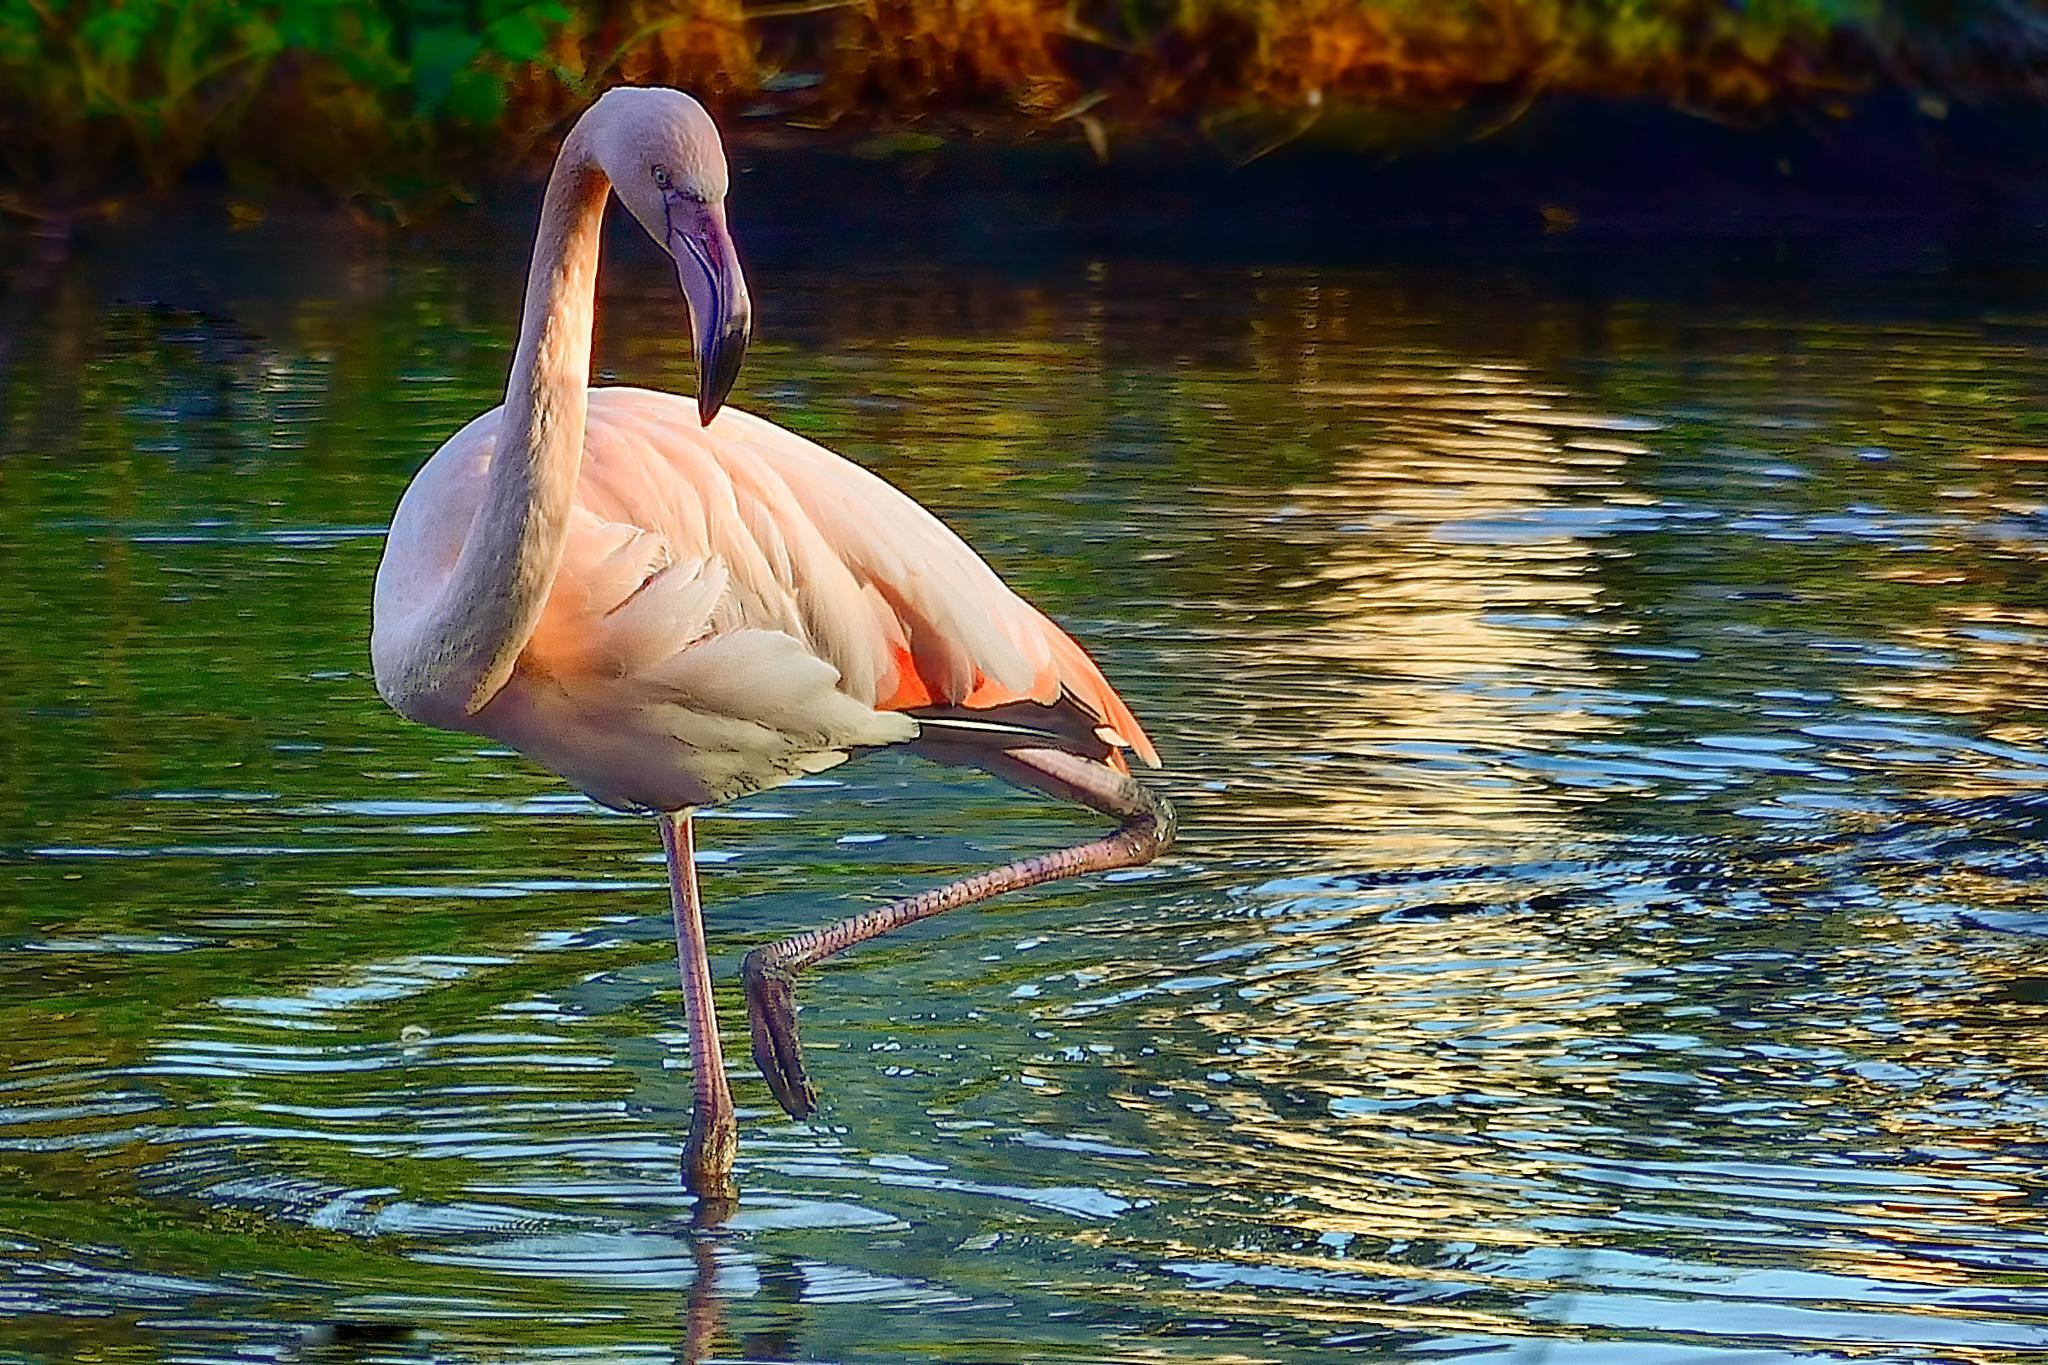 Flamingo looking for fish by Akanjee Nizam